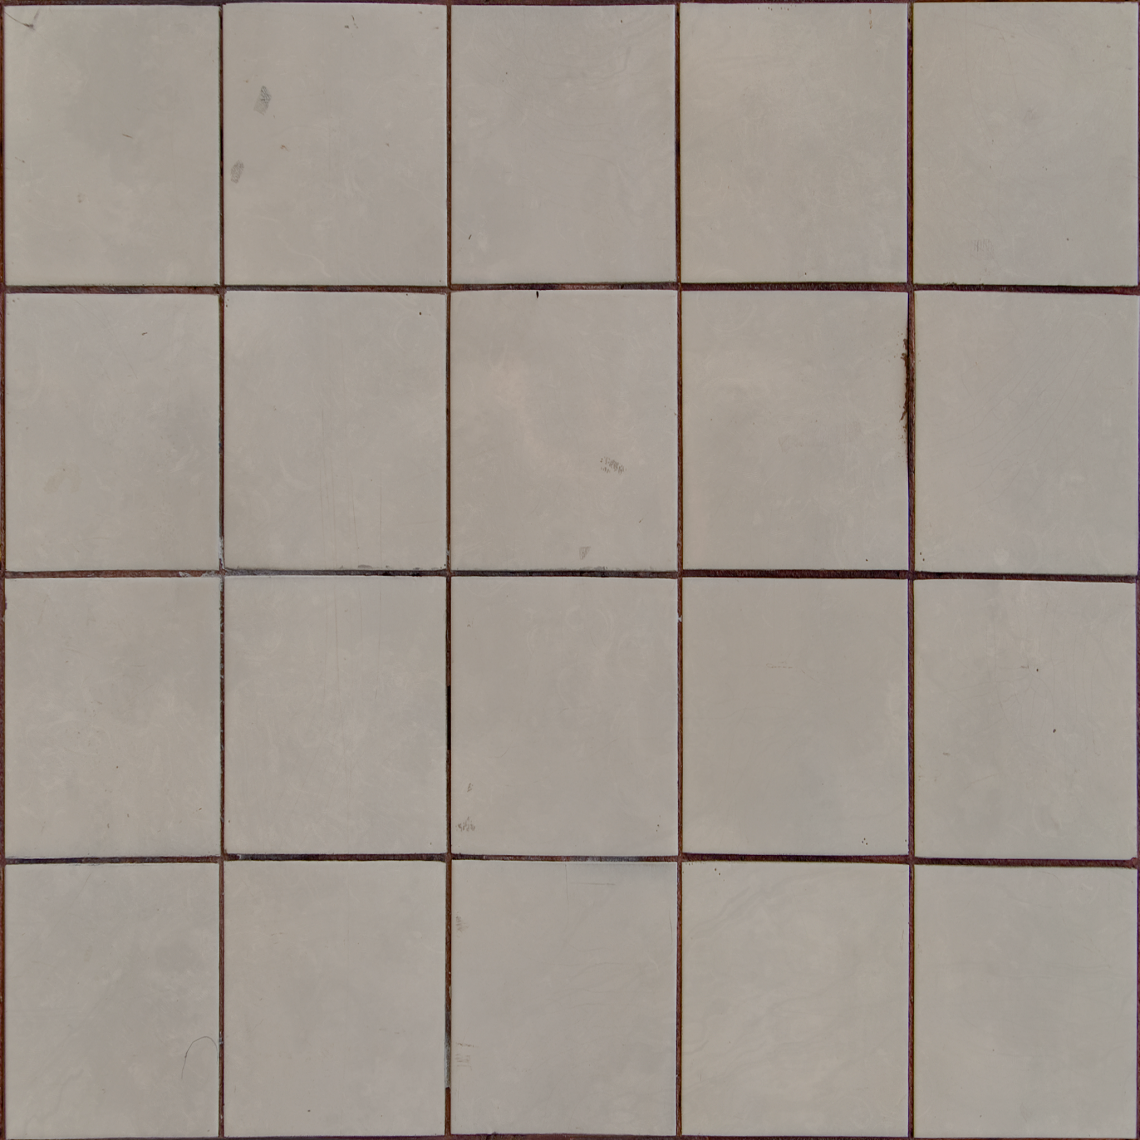 Simple-Tiles-03-Albedo